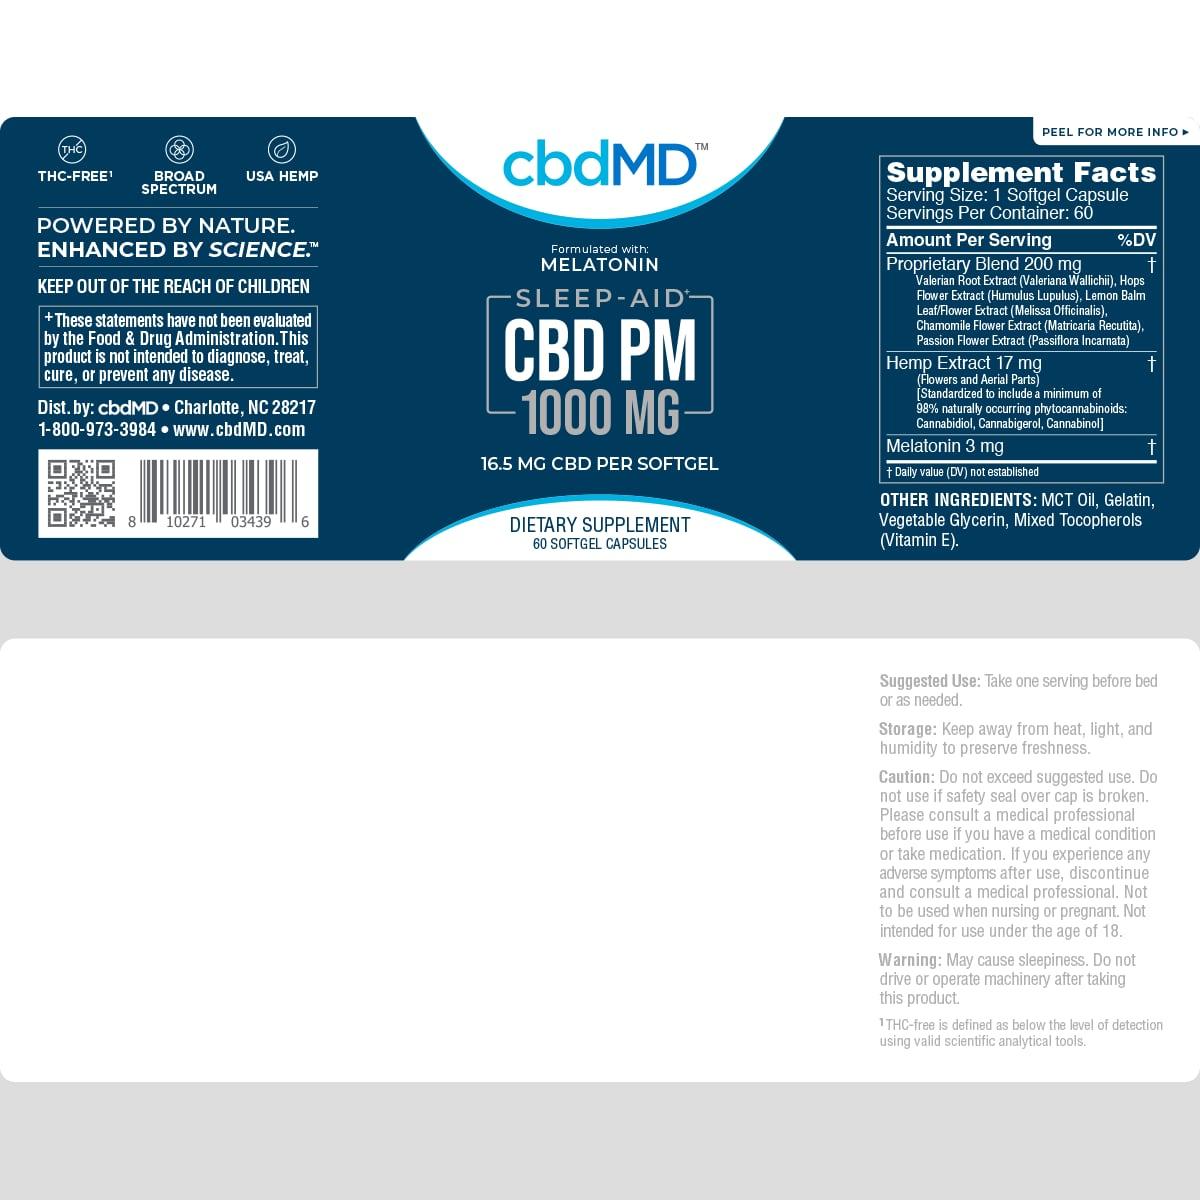 cbdMD, CBD PM Softgel Melatonin Capsules, Broad Spectrum THC-Free, 60-Count, 1000mg of CBD2